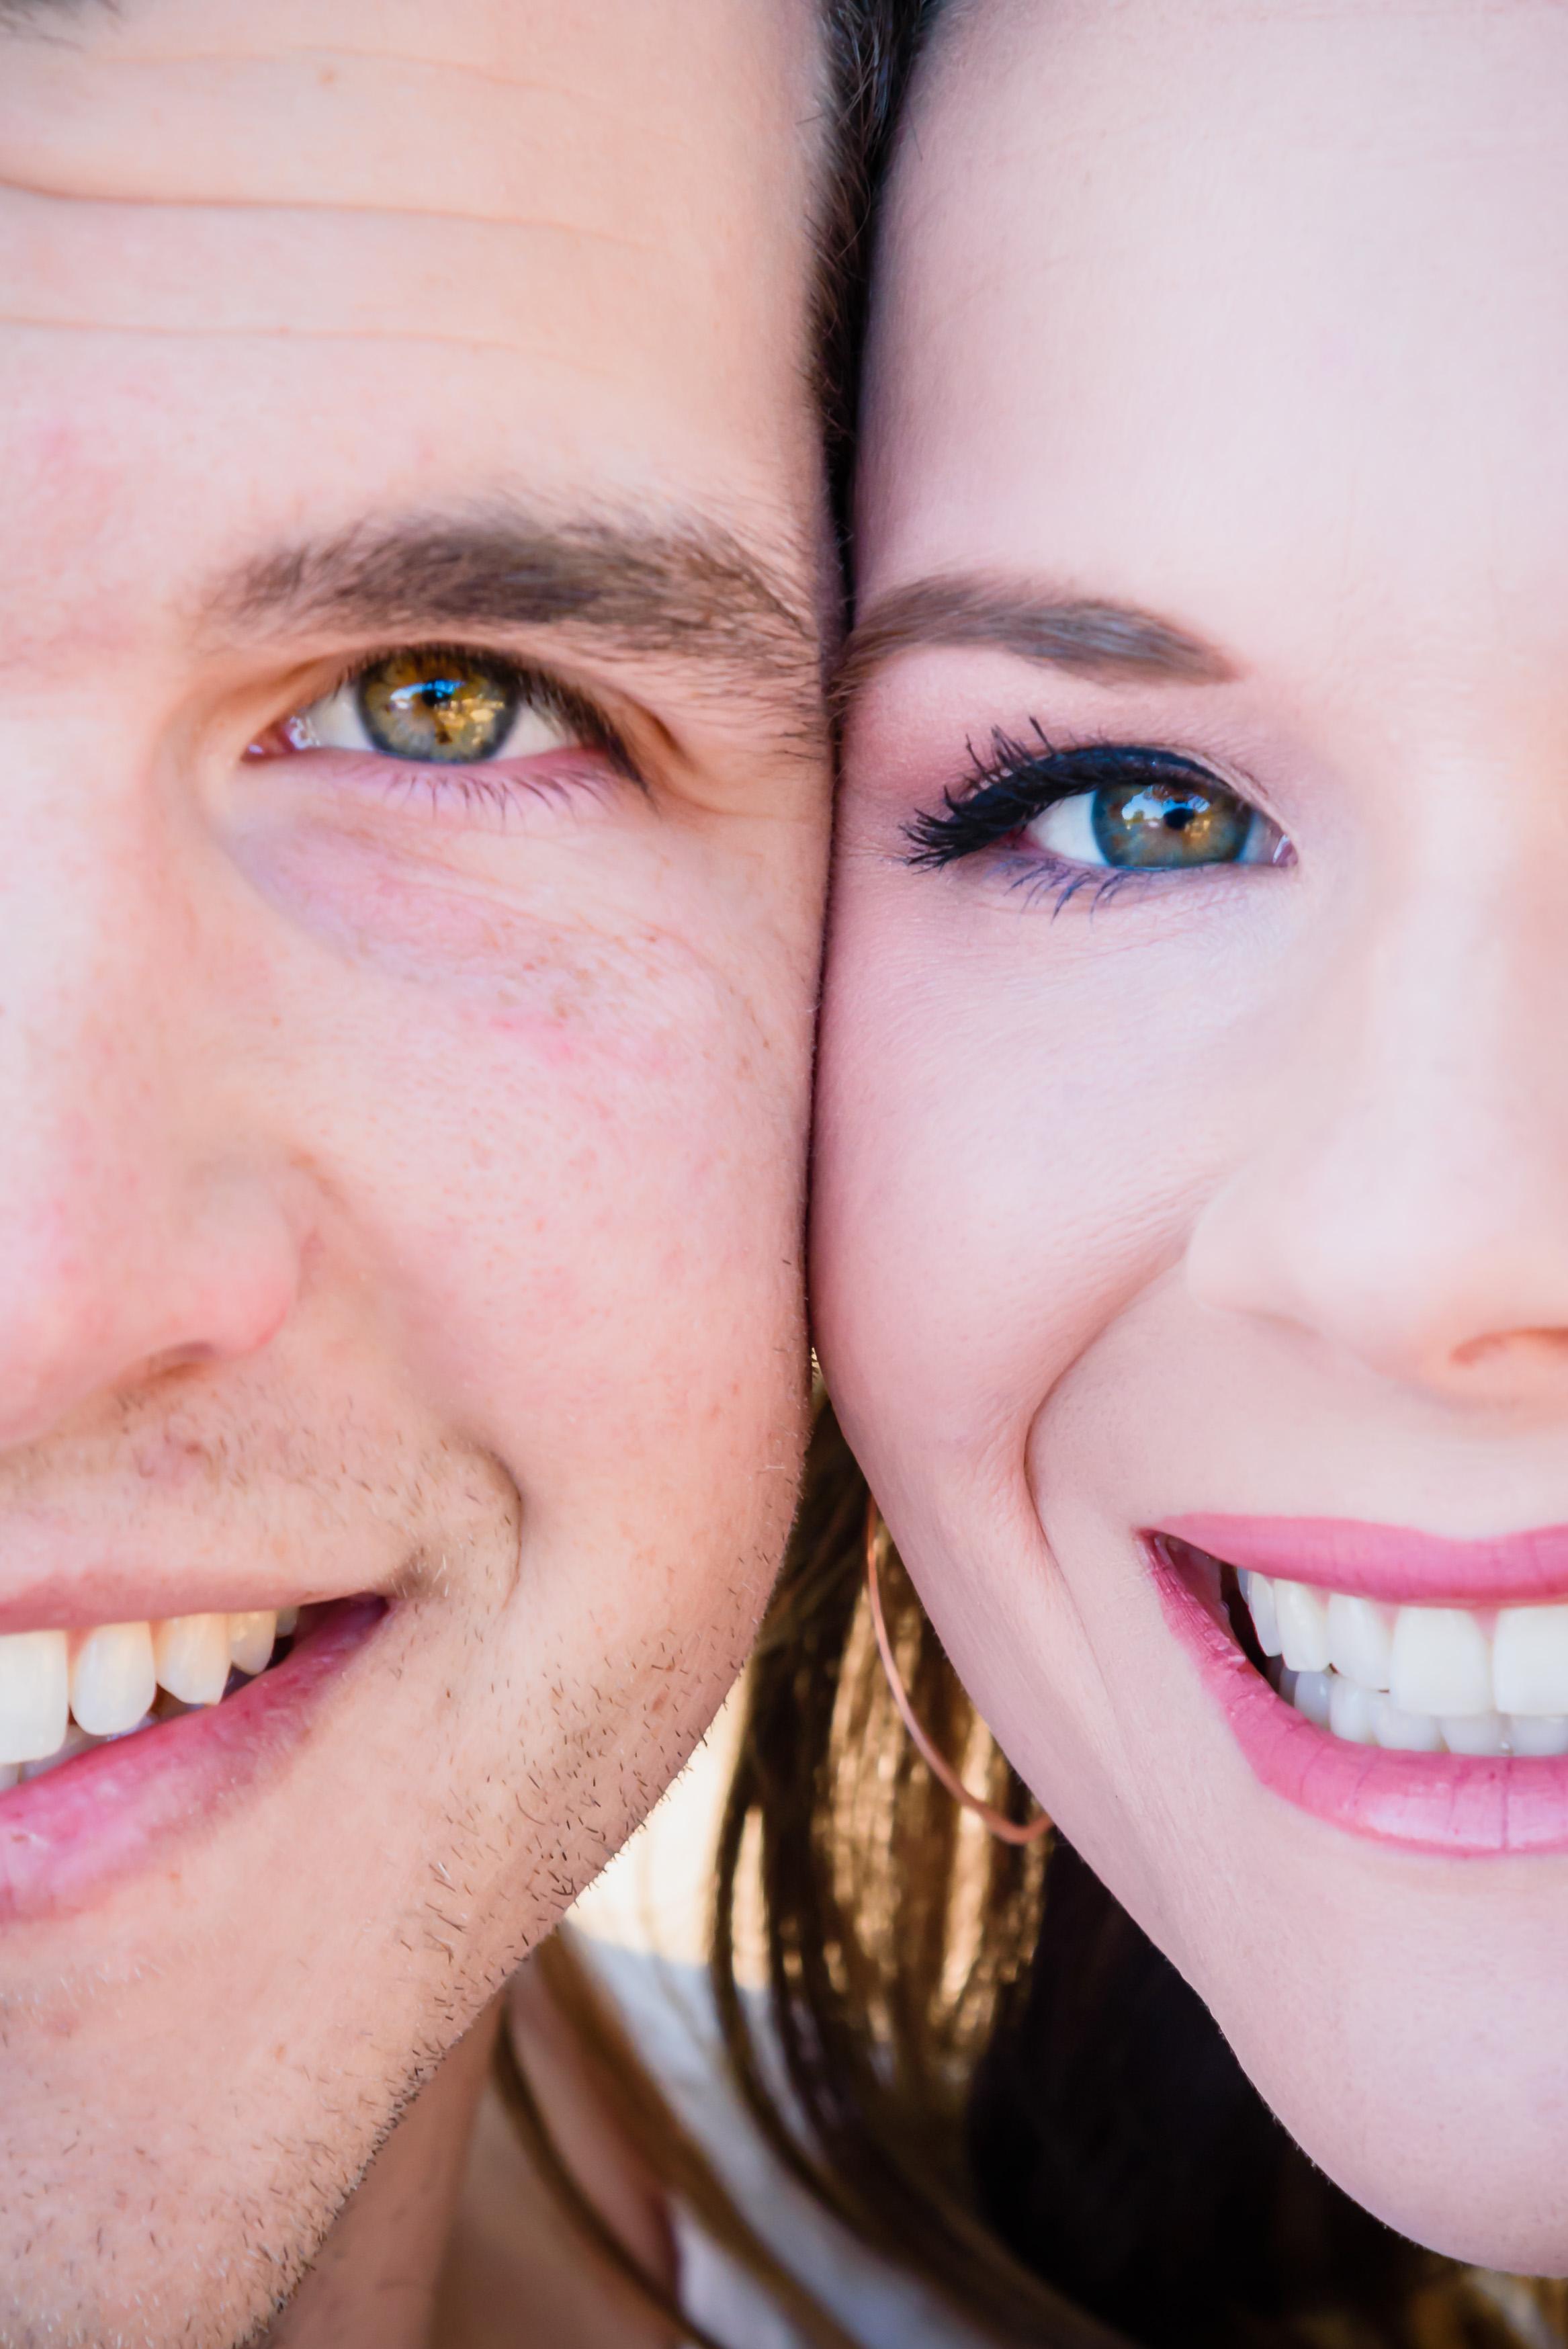 neilson family photography bay area photographer pleasanton couples eyes